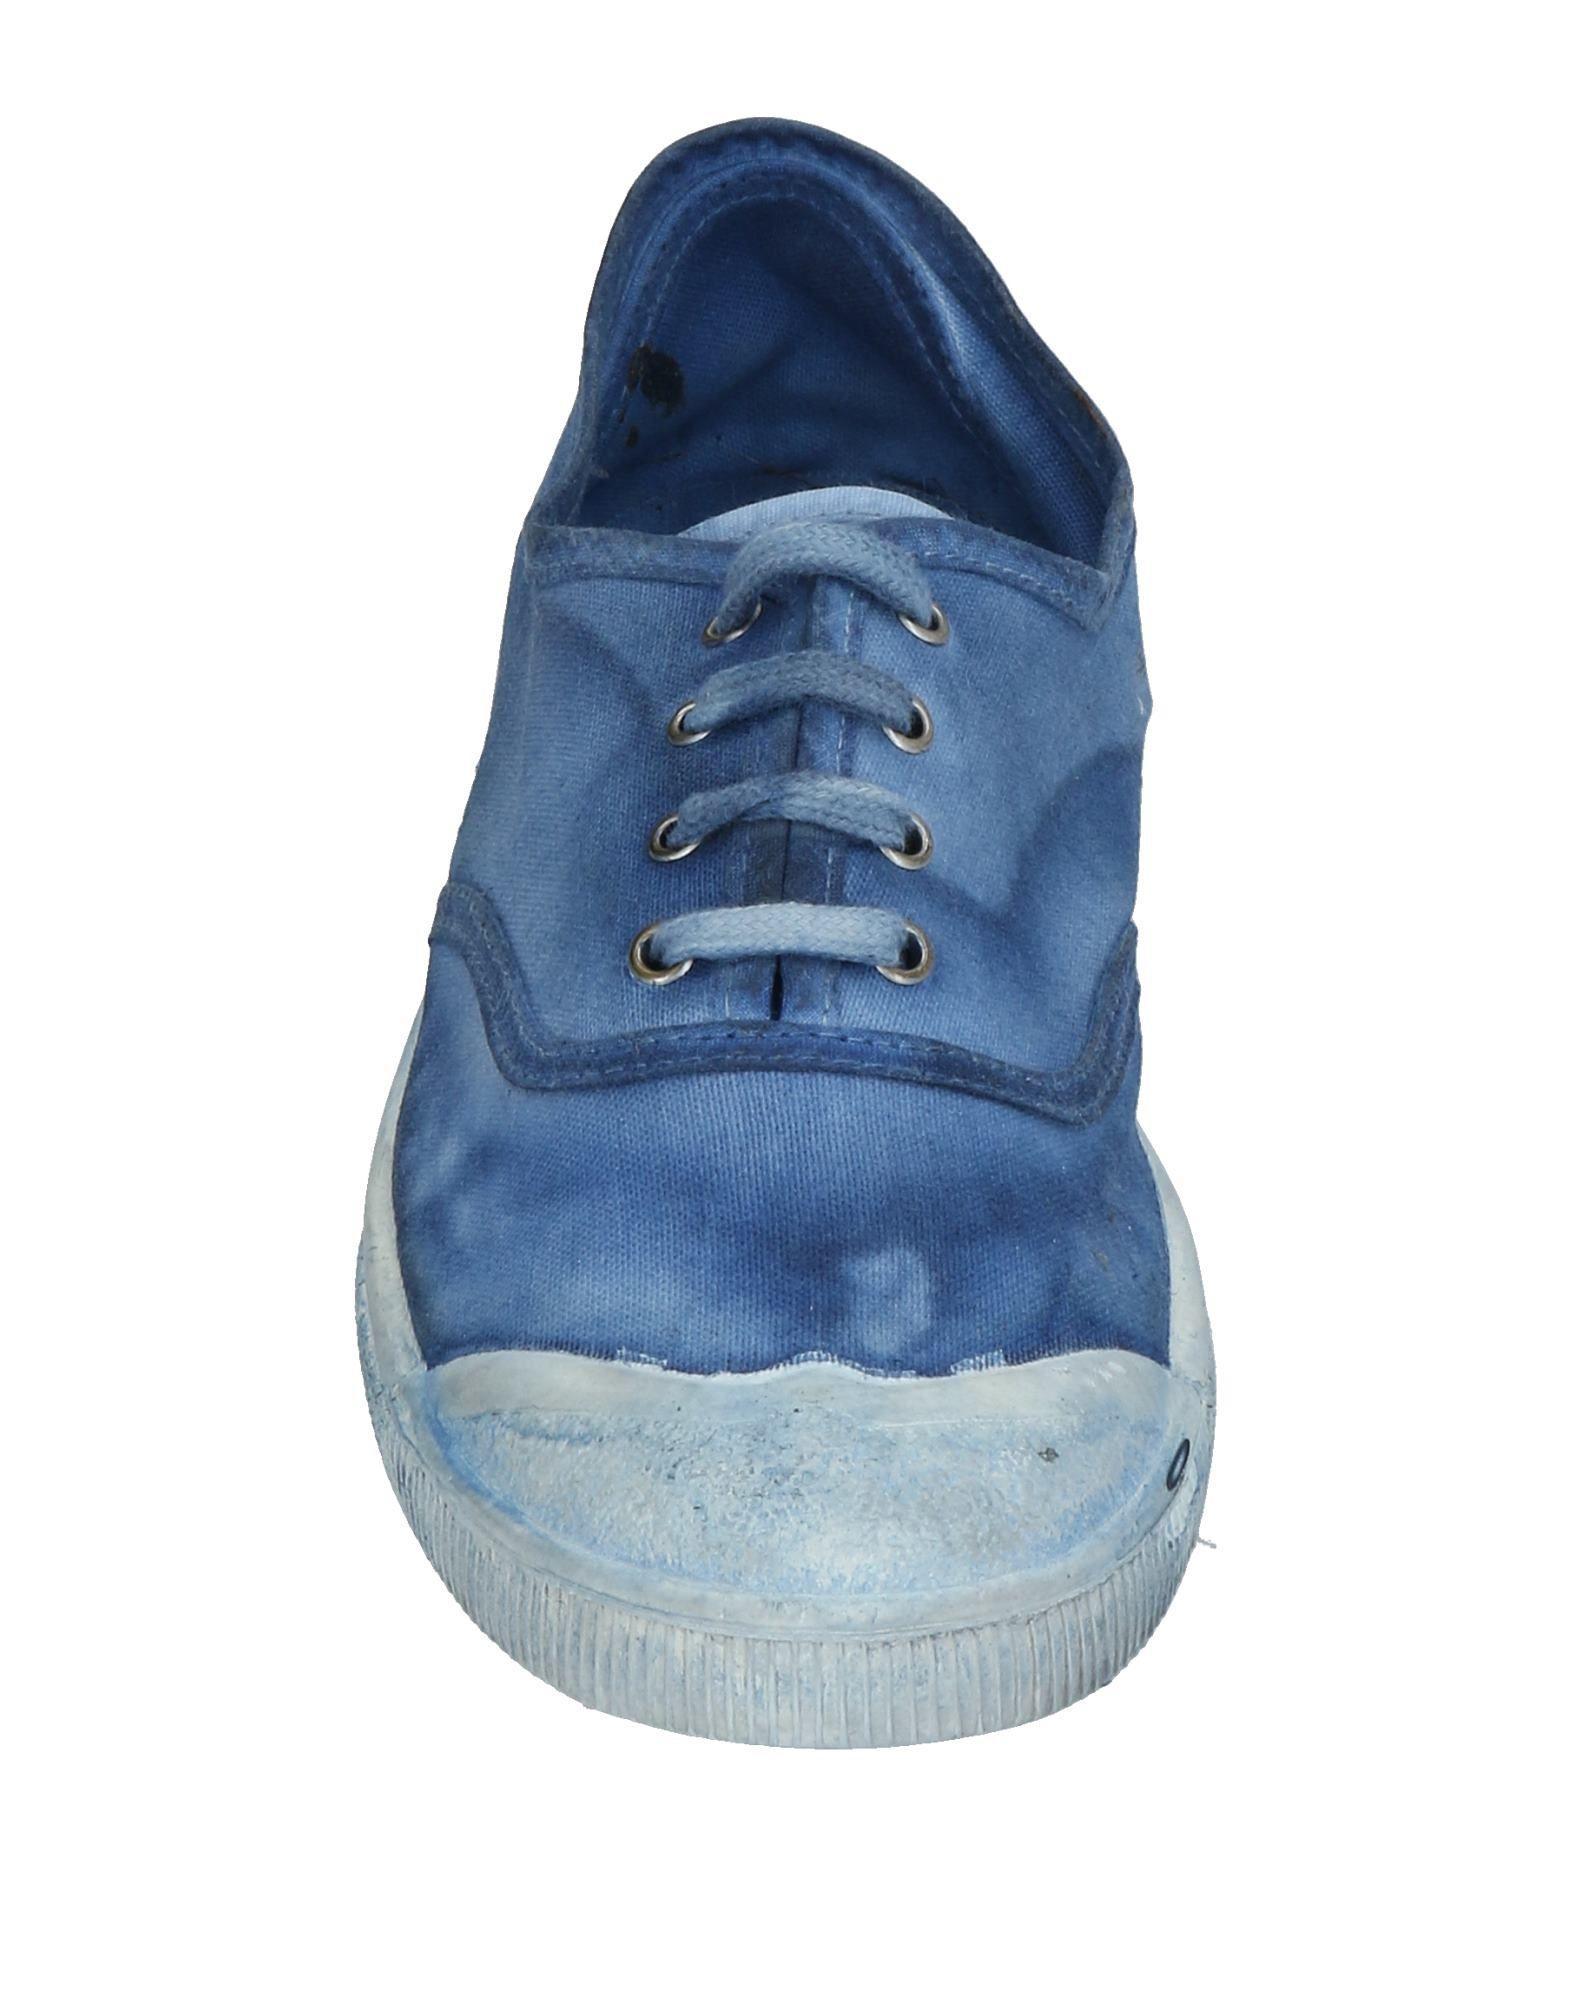 Jeffrey Campbell Low-tops & Sneakers in Azure (Blue)